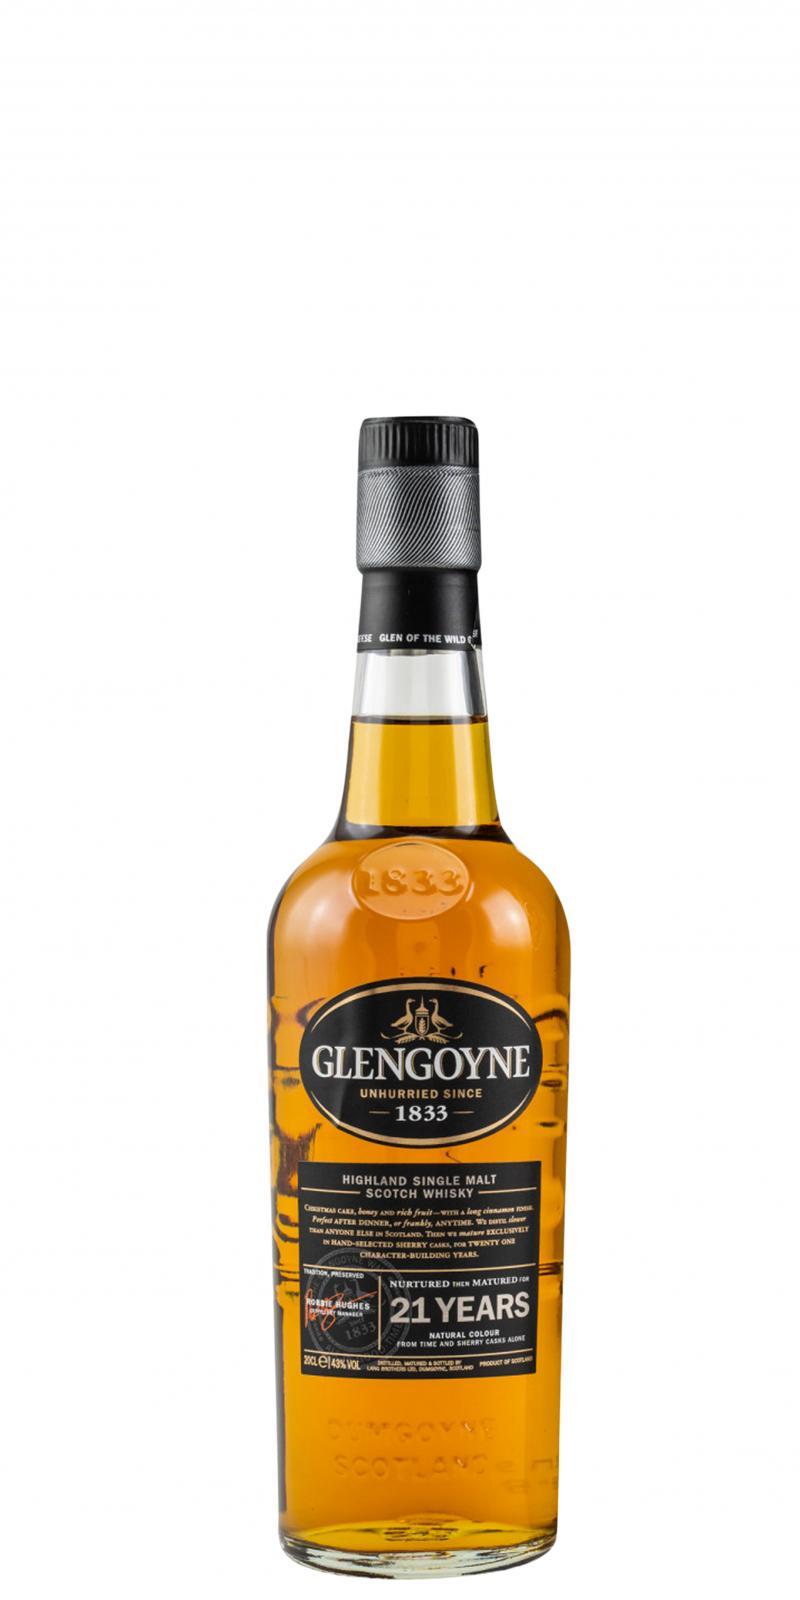 Glengoyne 21-year-old